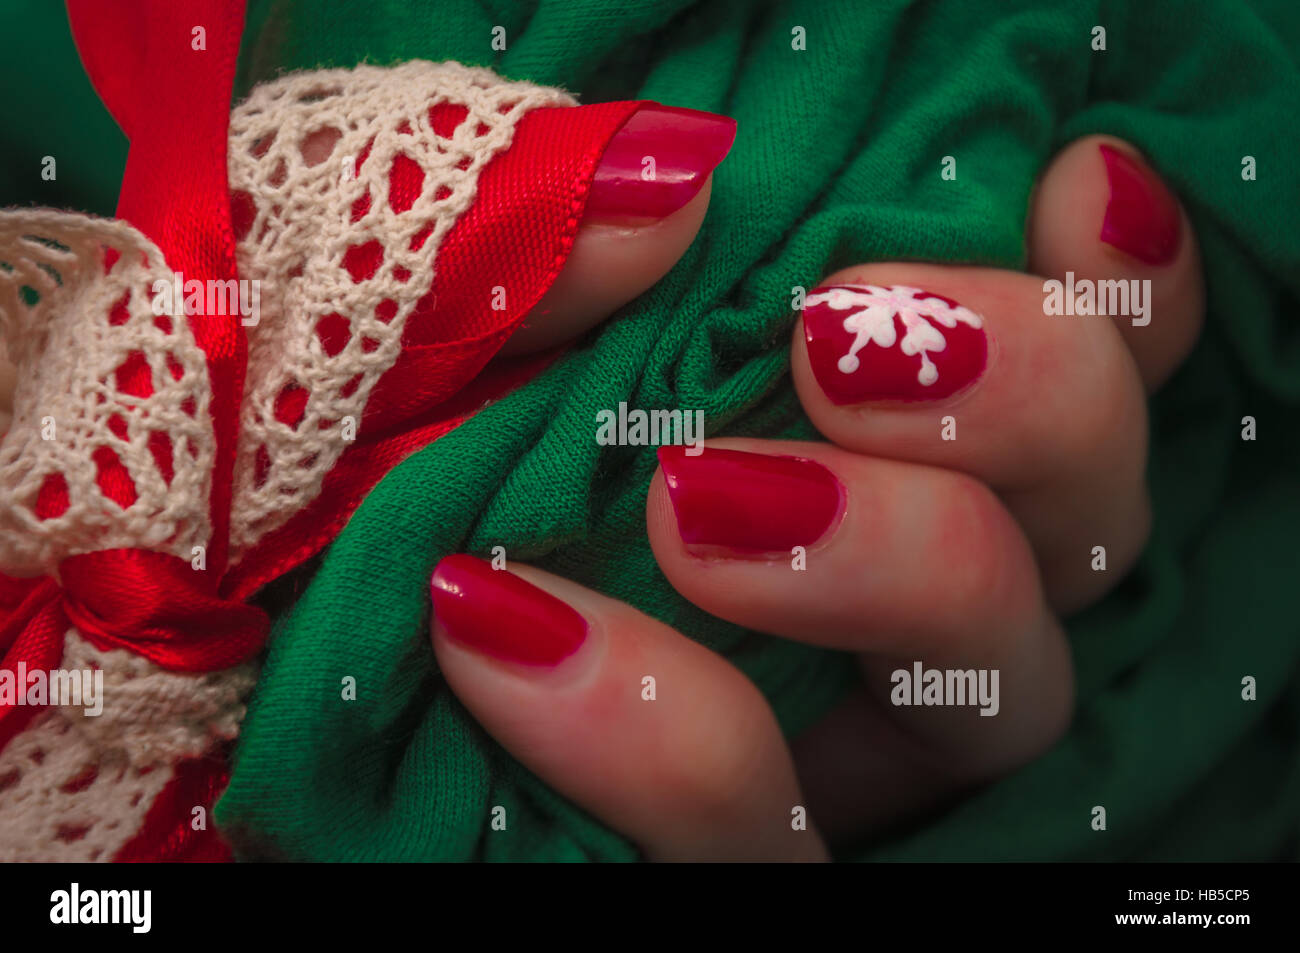 Hermosa Uñas Navidad Conjuntos Pulir Regalo - Ideas Para Pintar Uñas ...